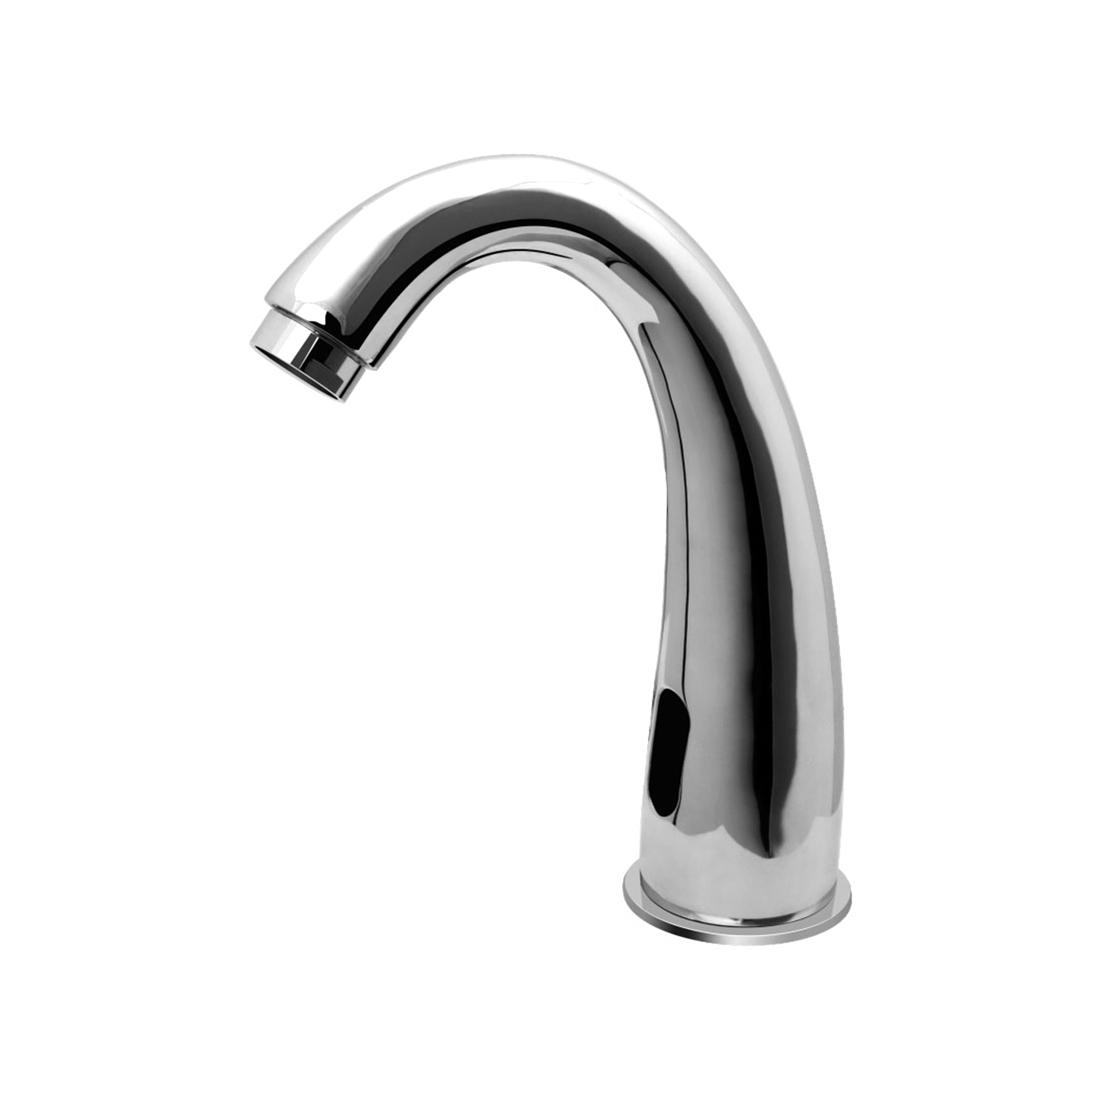 Kerovit KBST001 Sensor Tap for Wash Basin